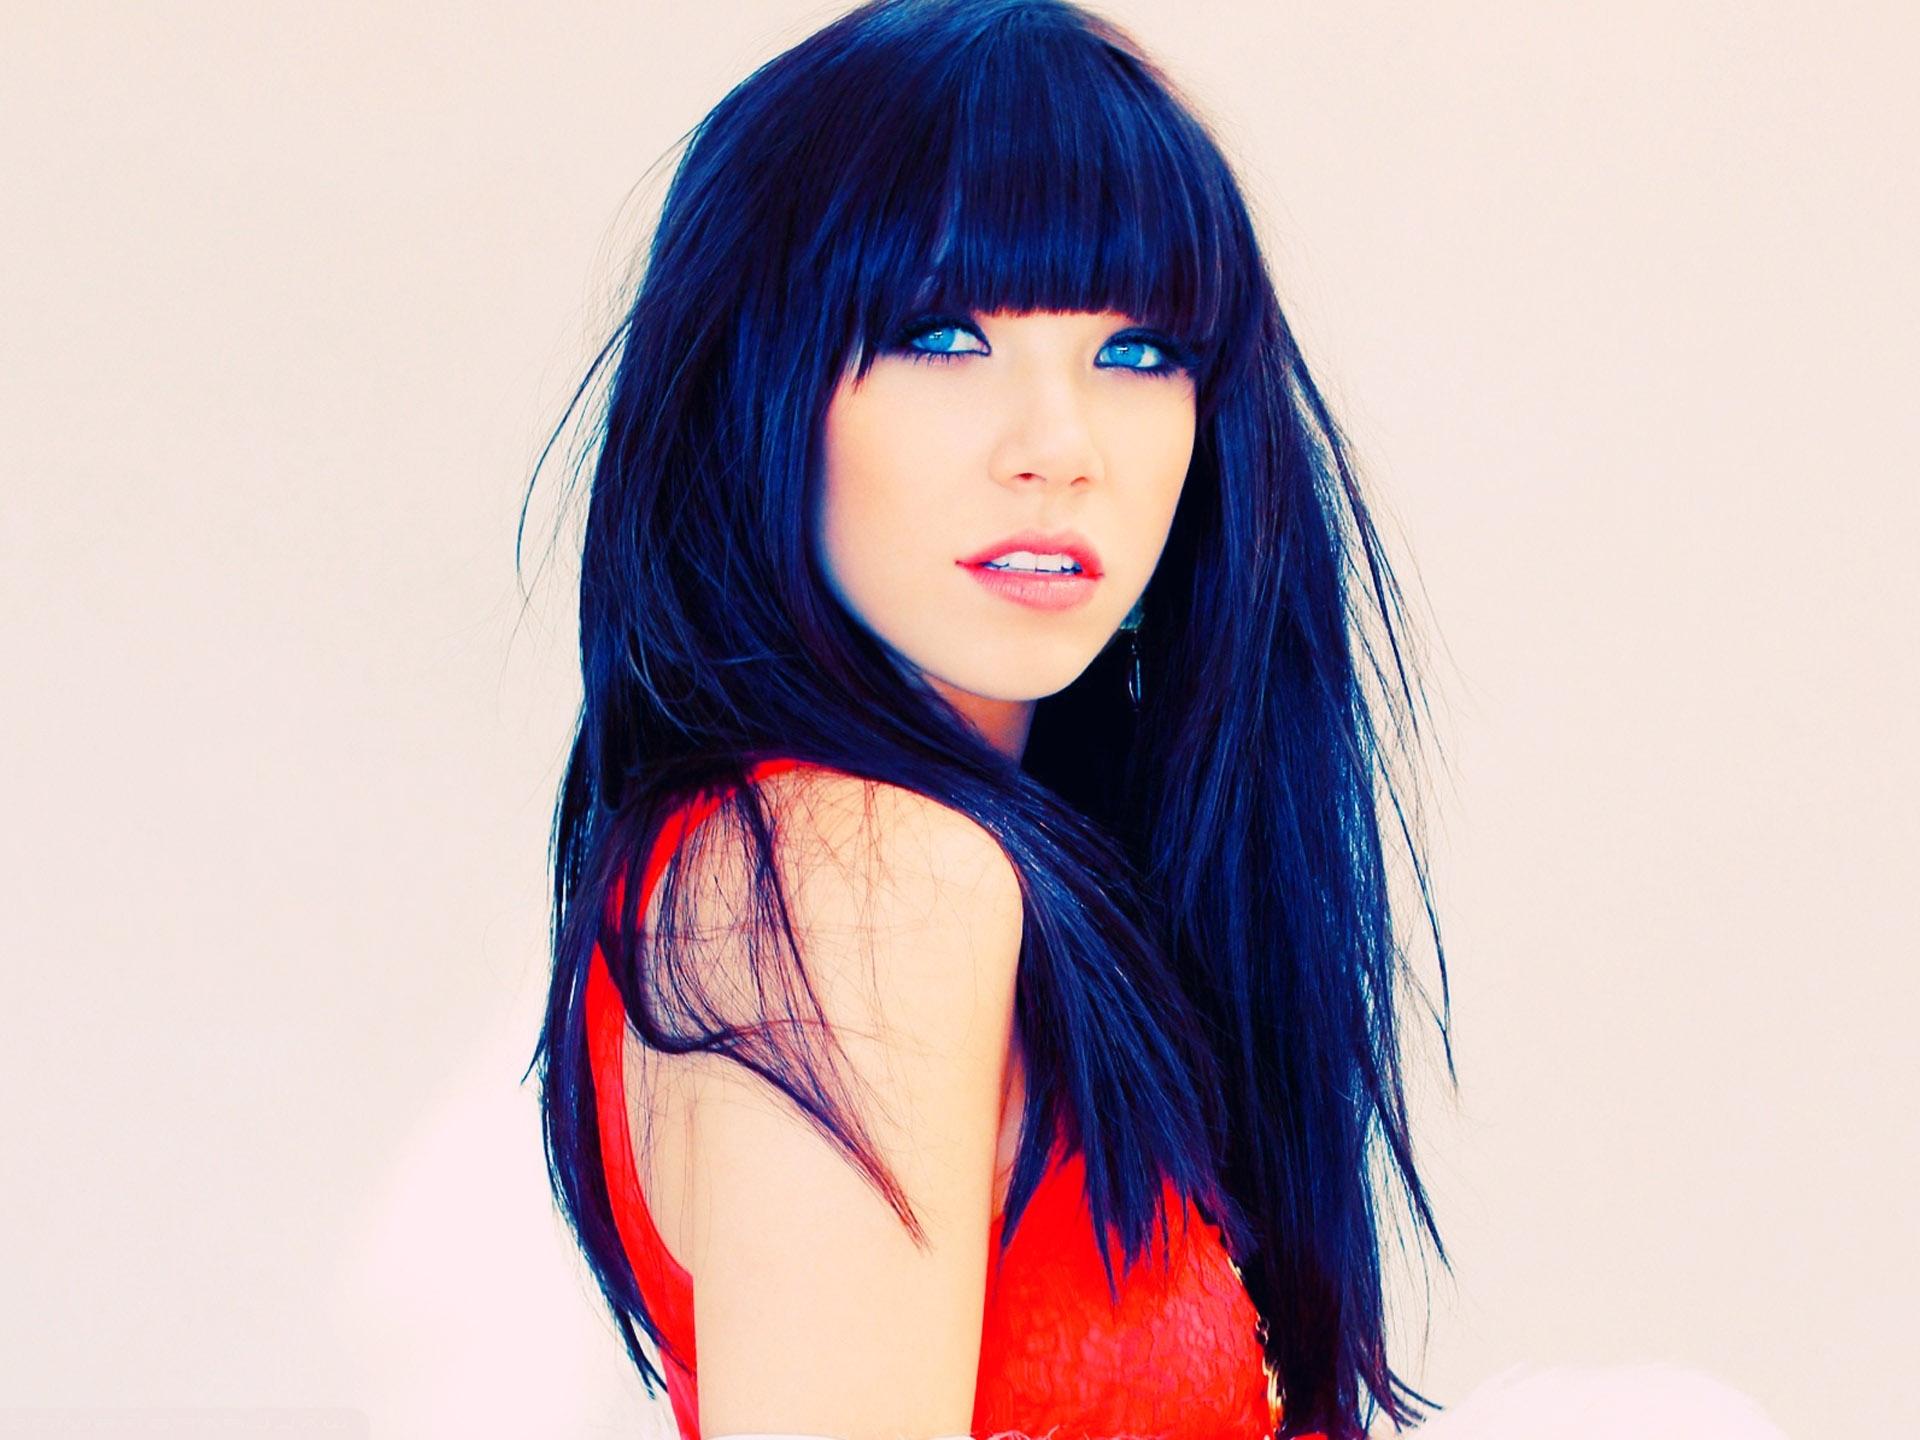 Carly Rae Jepsen Bright Blue Hair Colors 54 Beauty Model